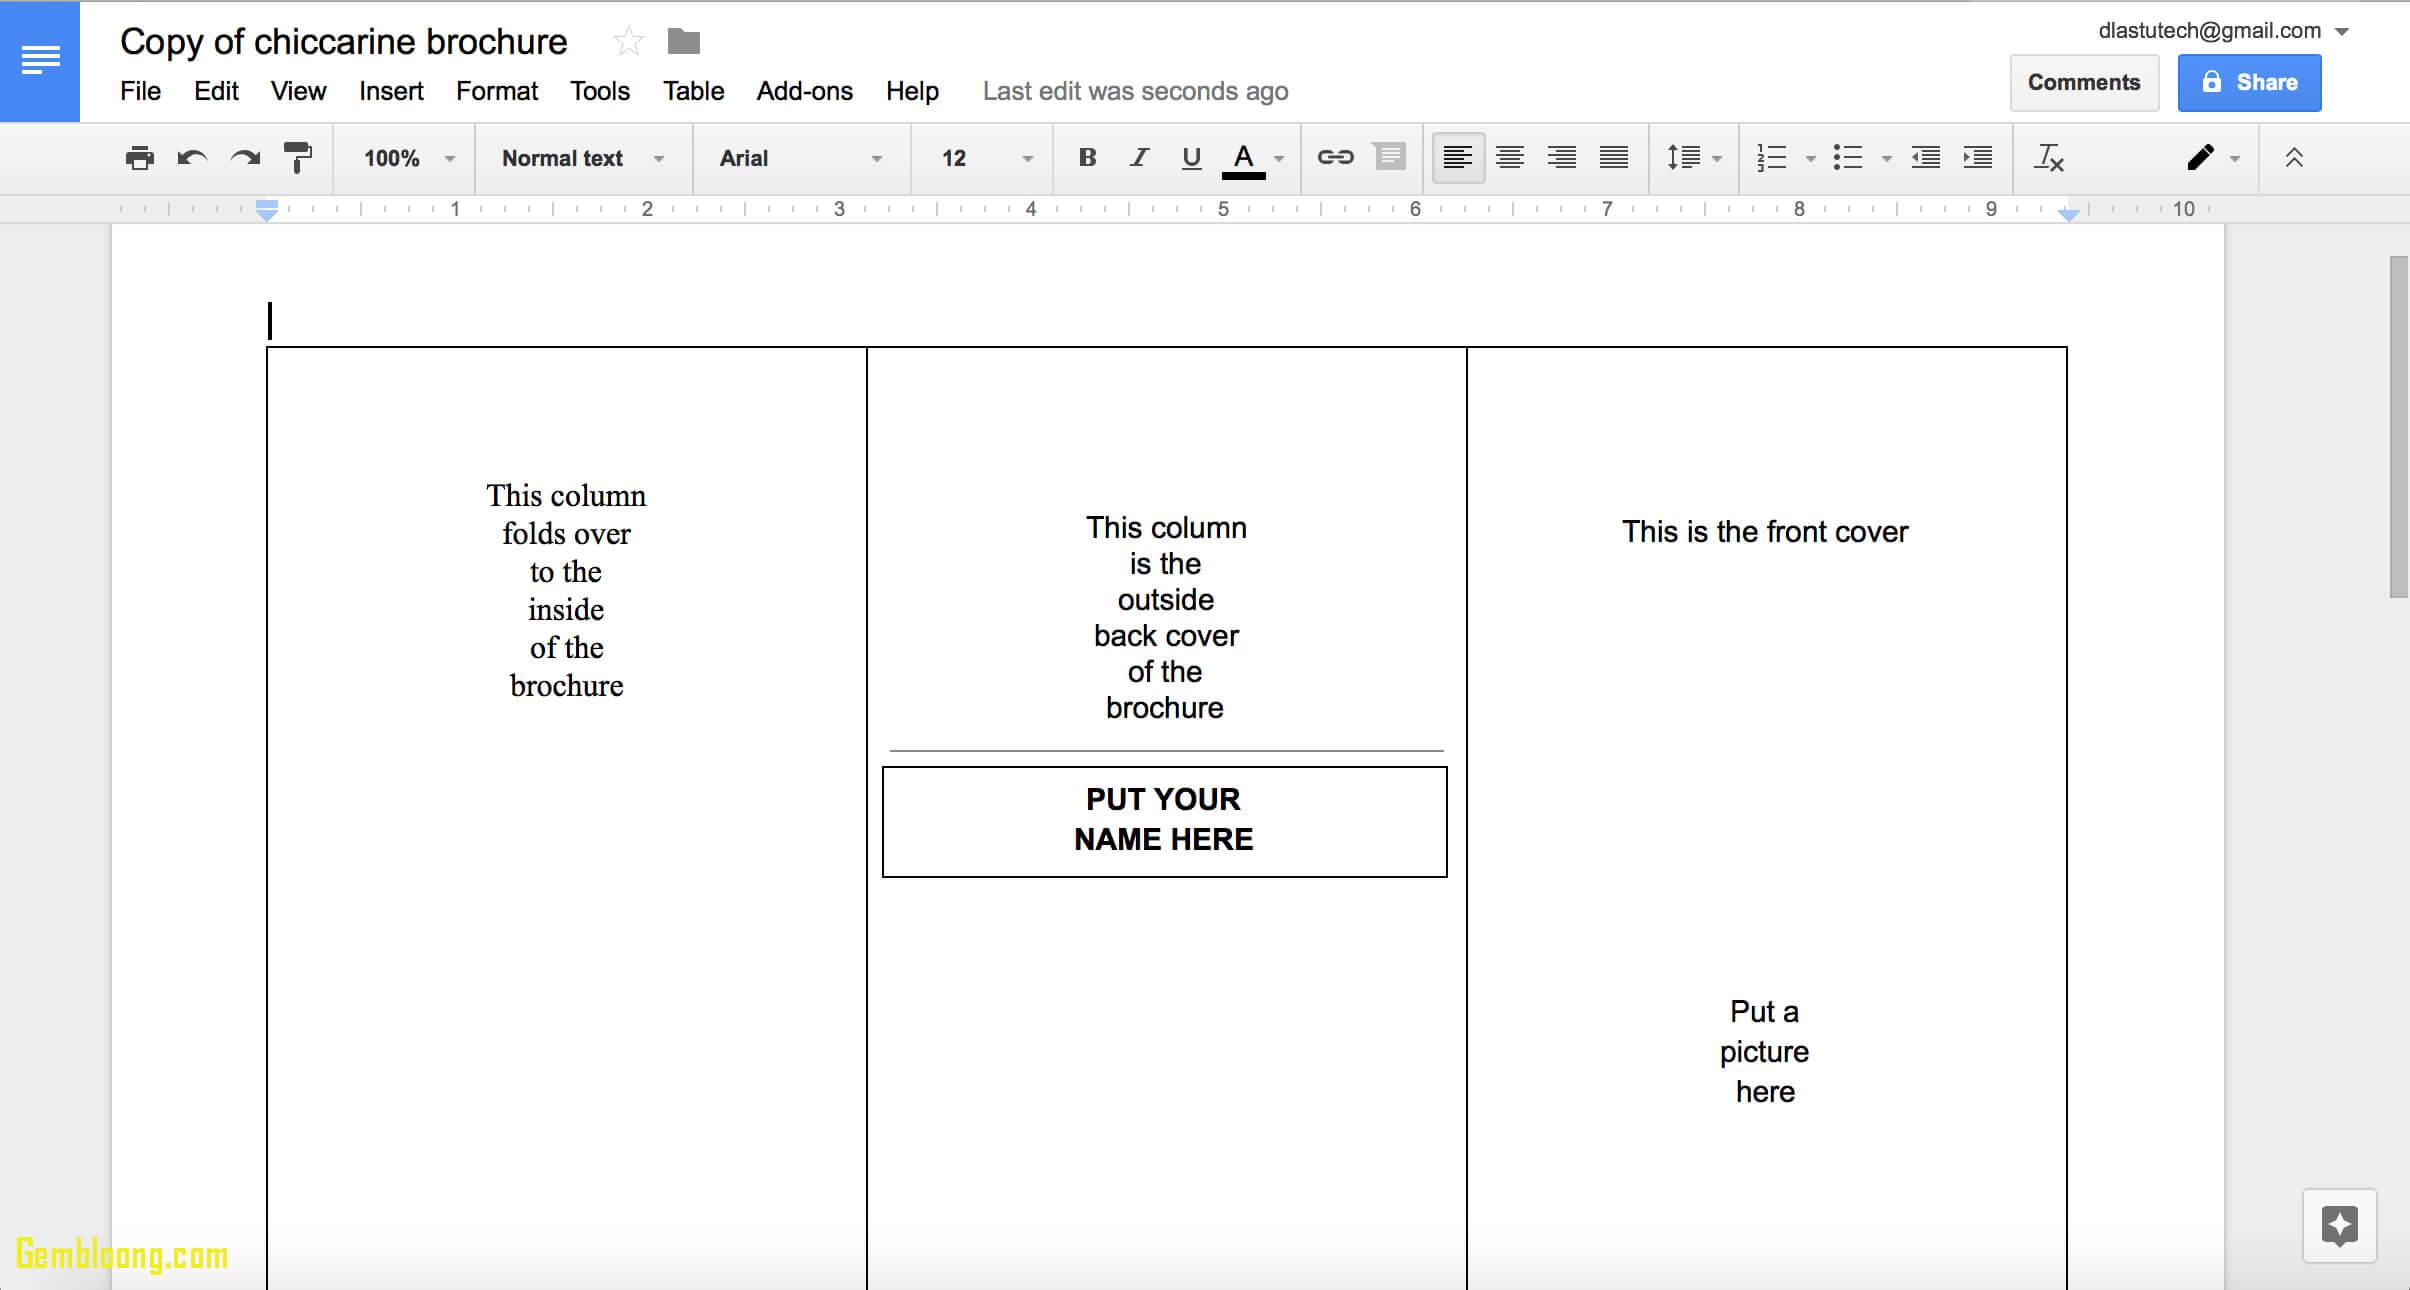 Google Drive Brochure Template - Cokhithuanpham Pertaining To Google Drive Brochure Template